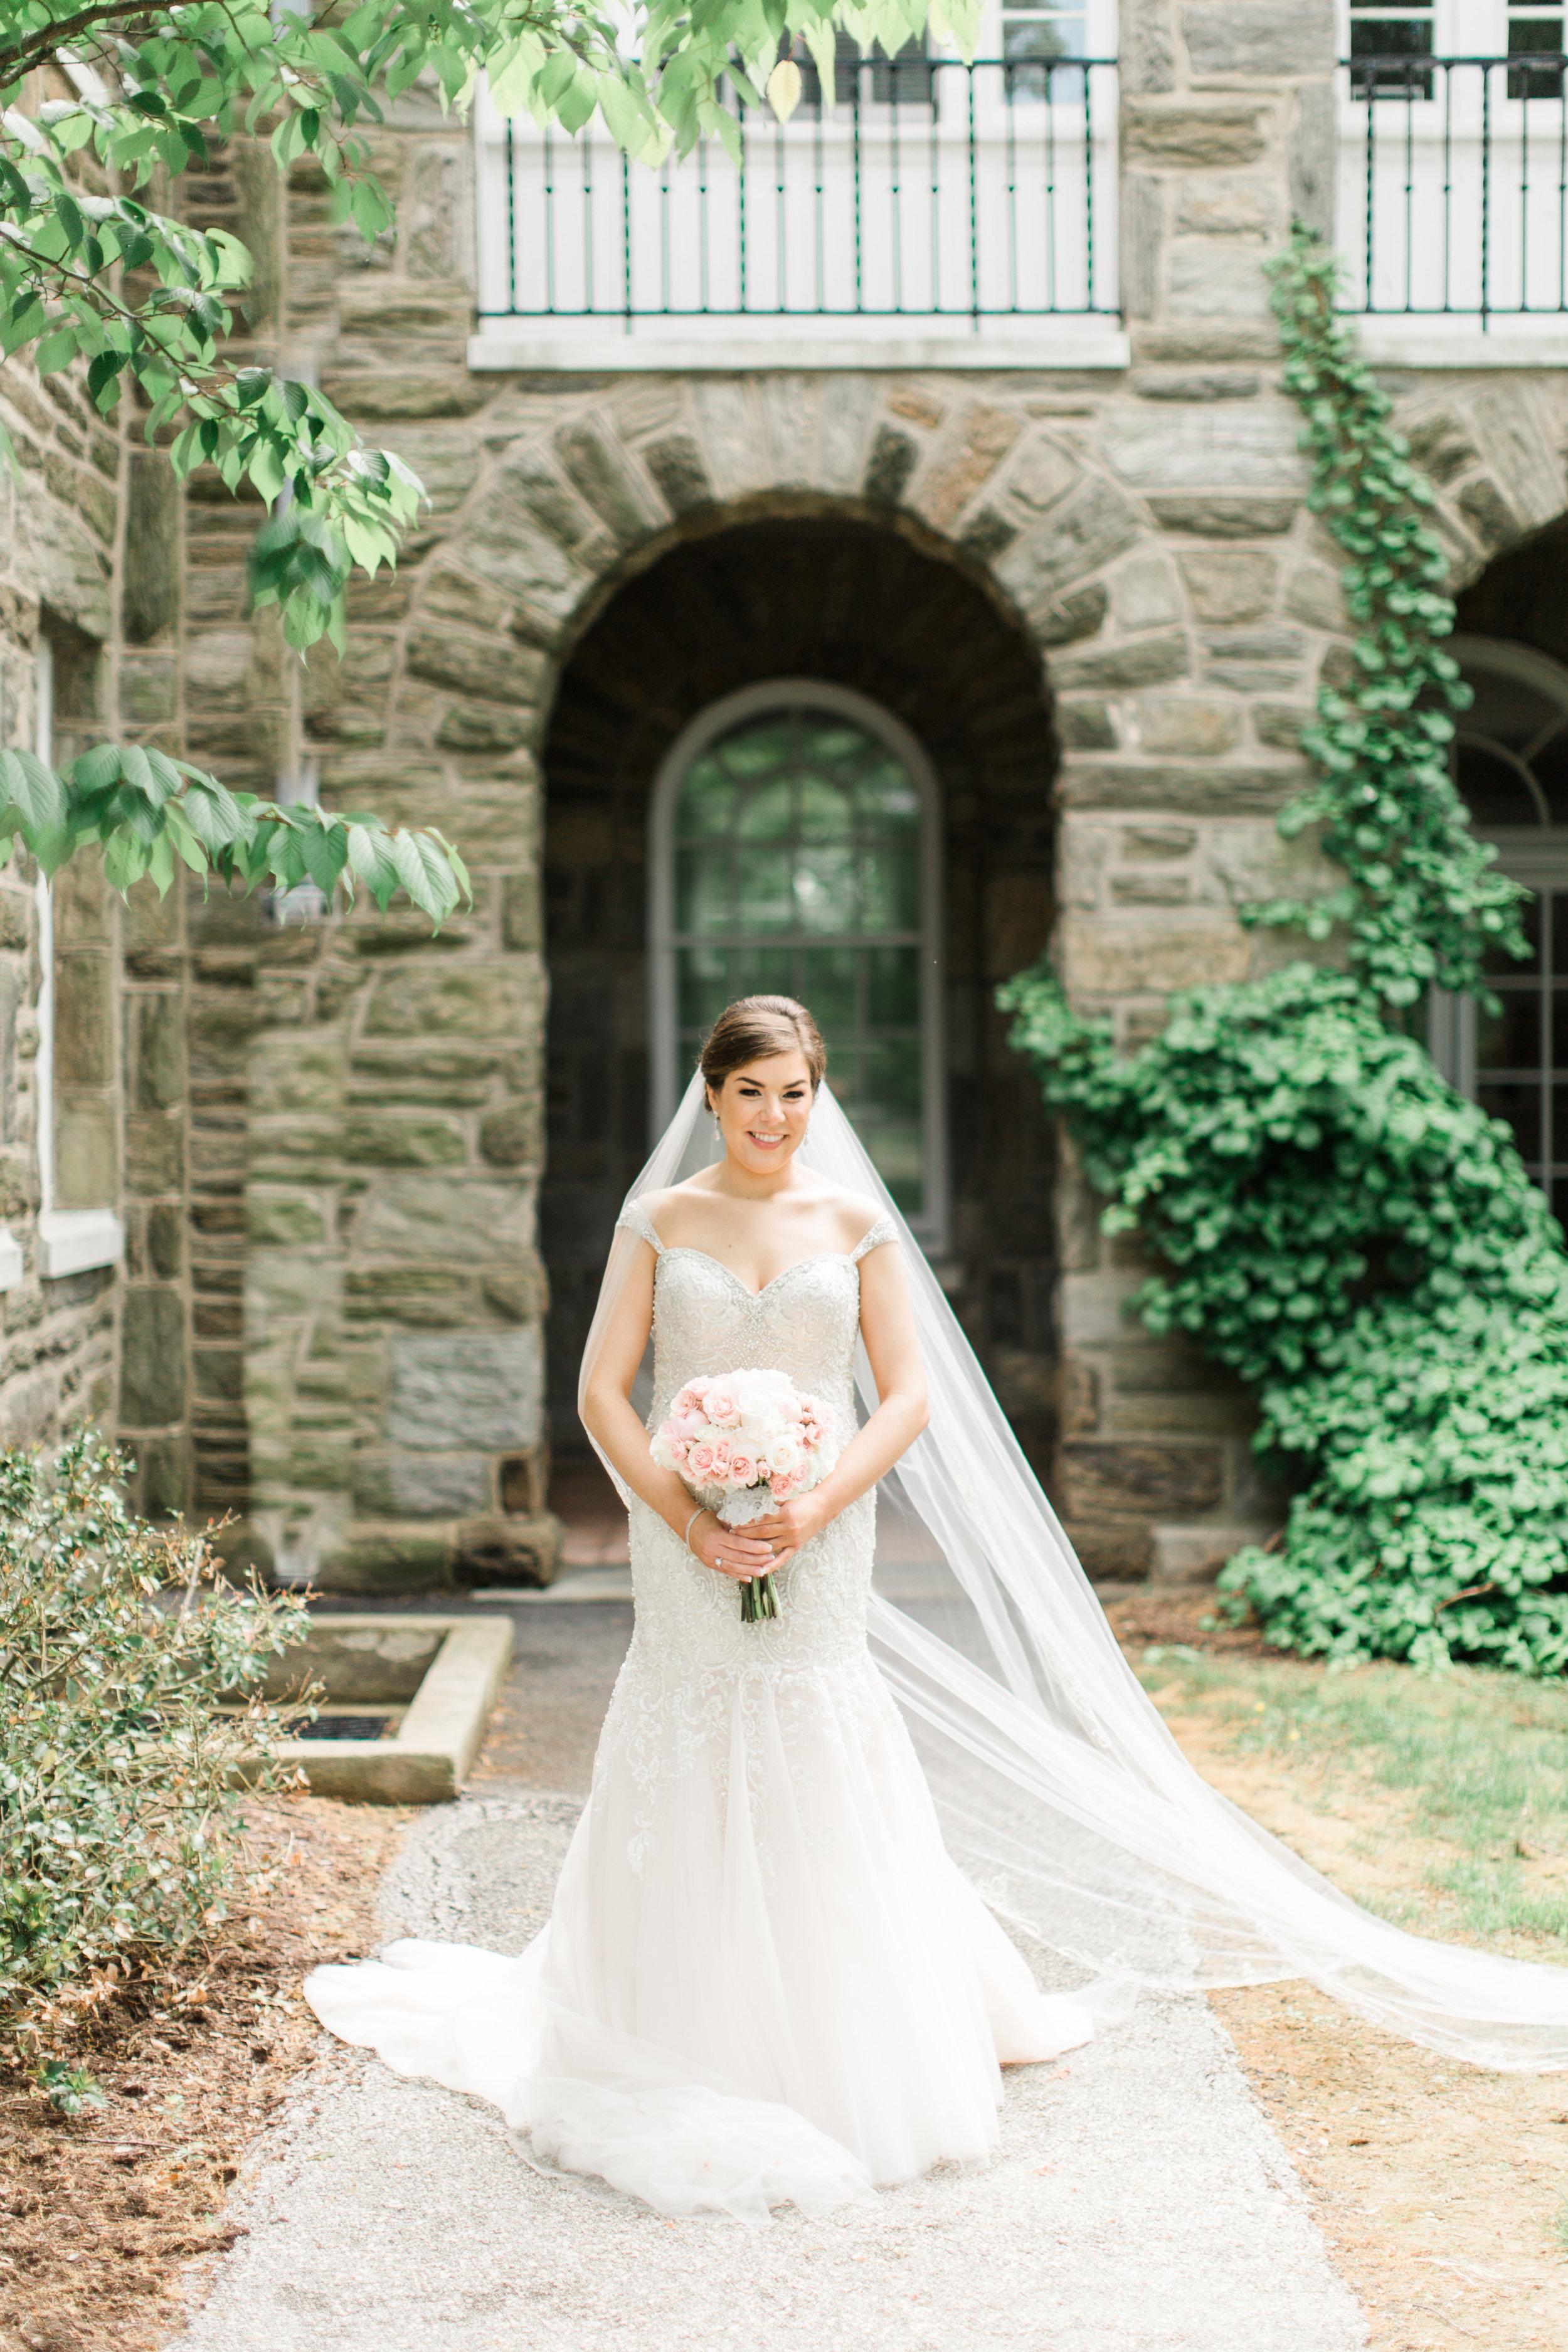 kellyandjoe_wedding (320 of 1296).jpg